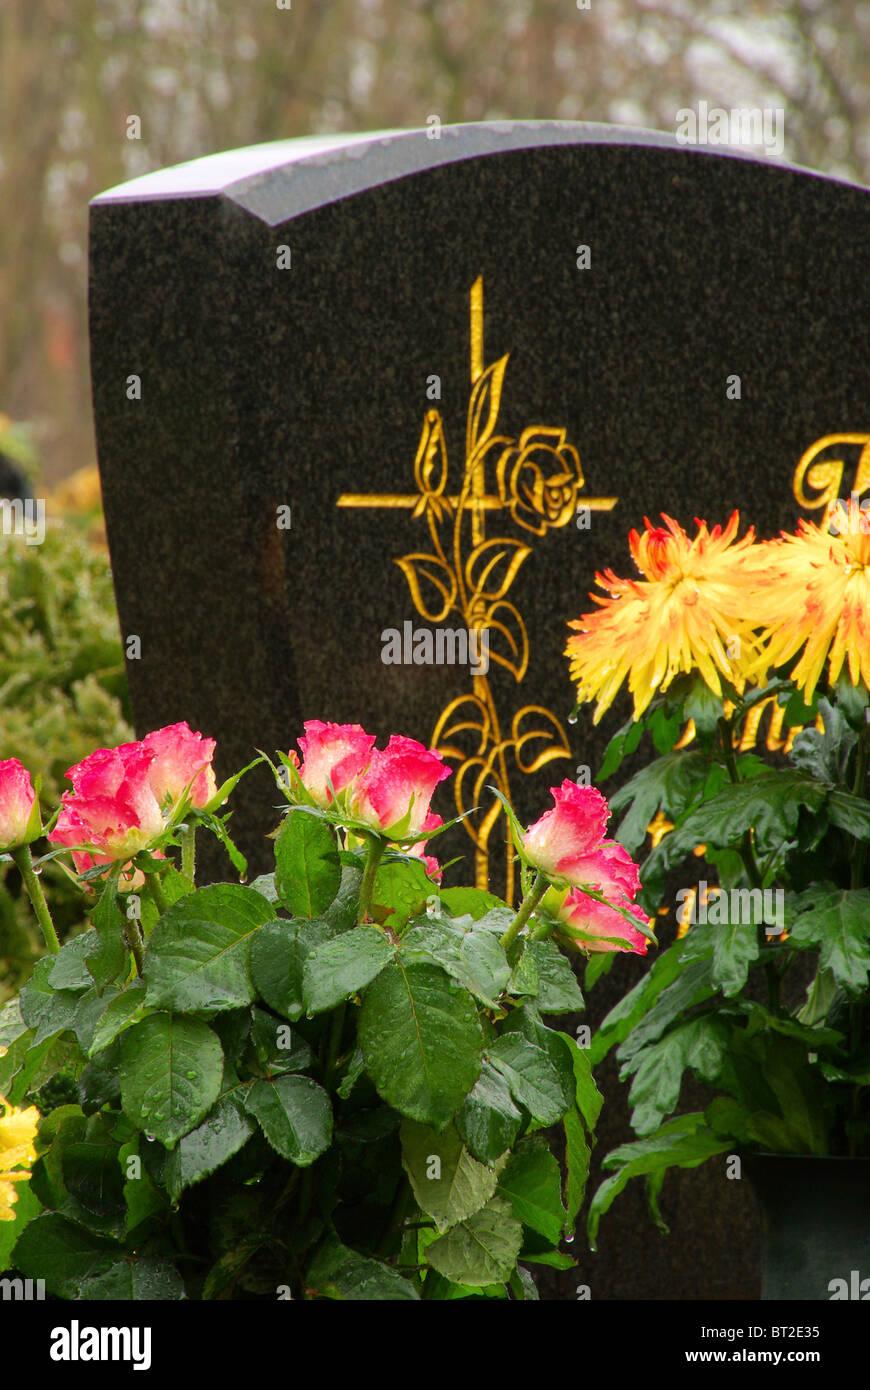 Friedhofsgesteck - floral arrangement cemetery 24 - Stock Image